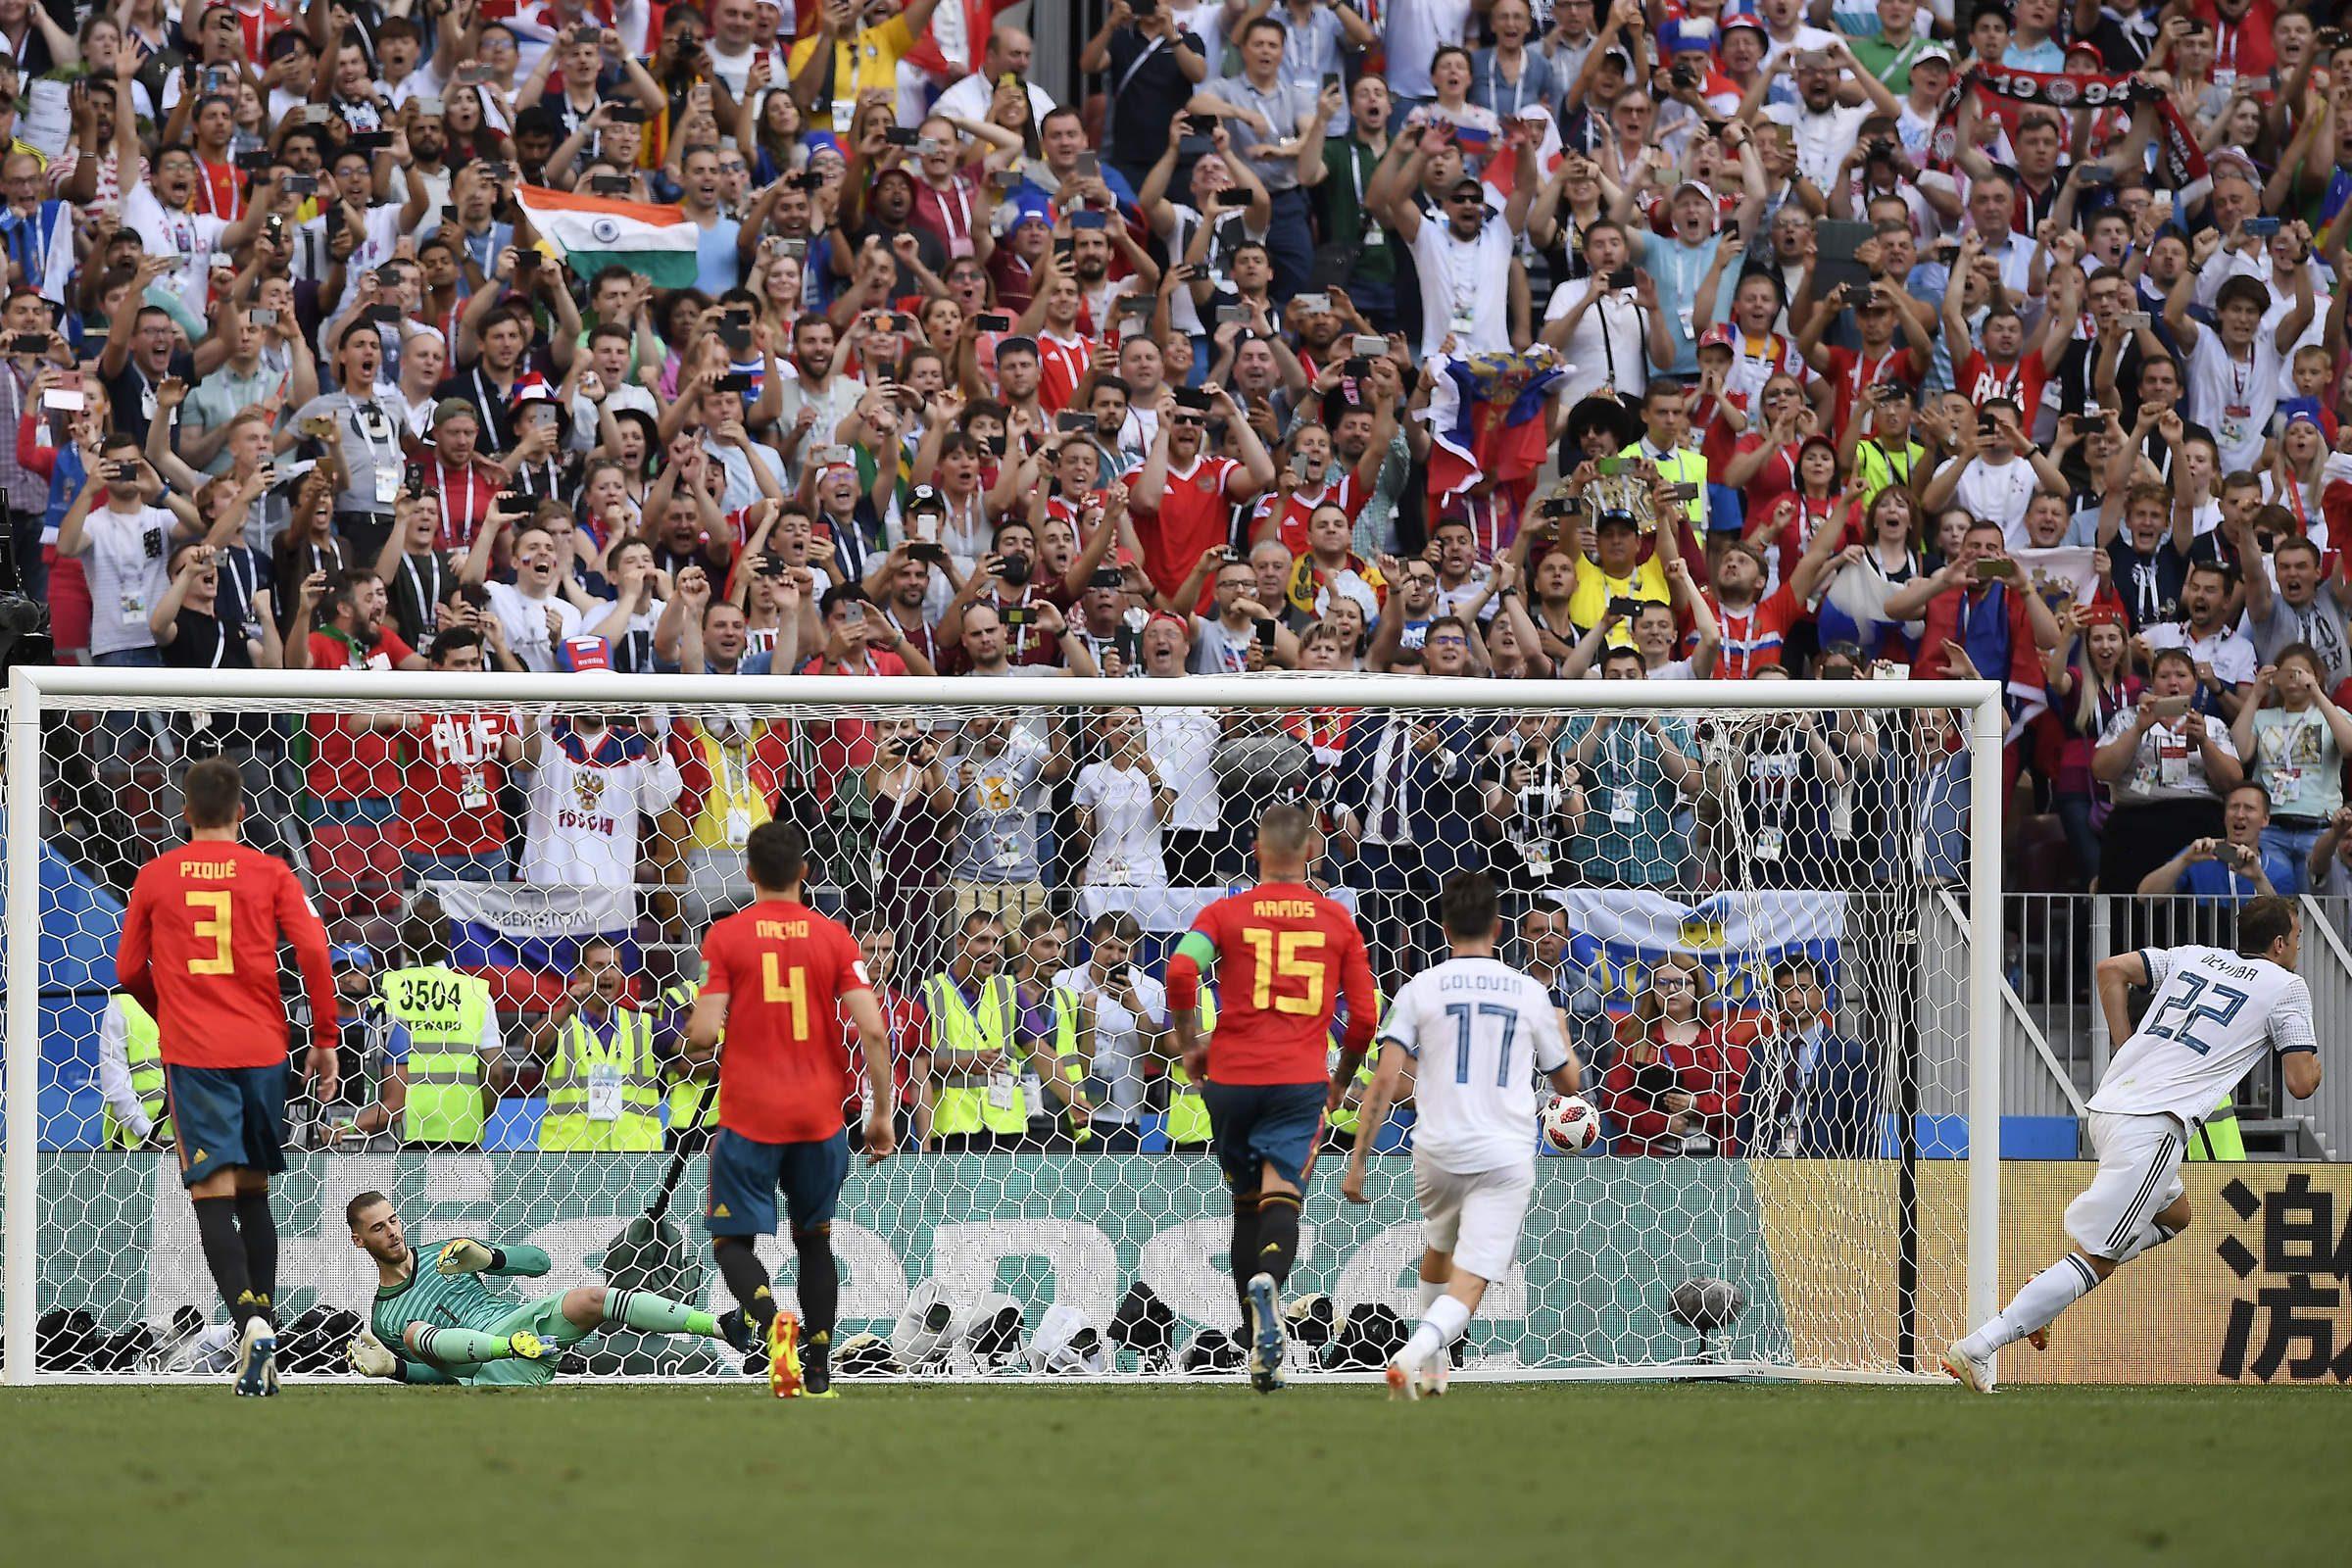 Mondiale, sarà Francia-Belgio in Semifinale: eliminati Uruguay e Brasile